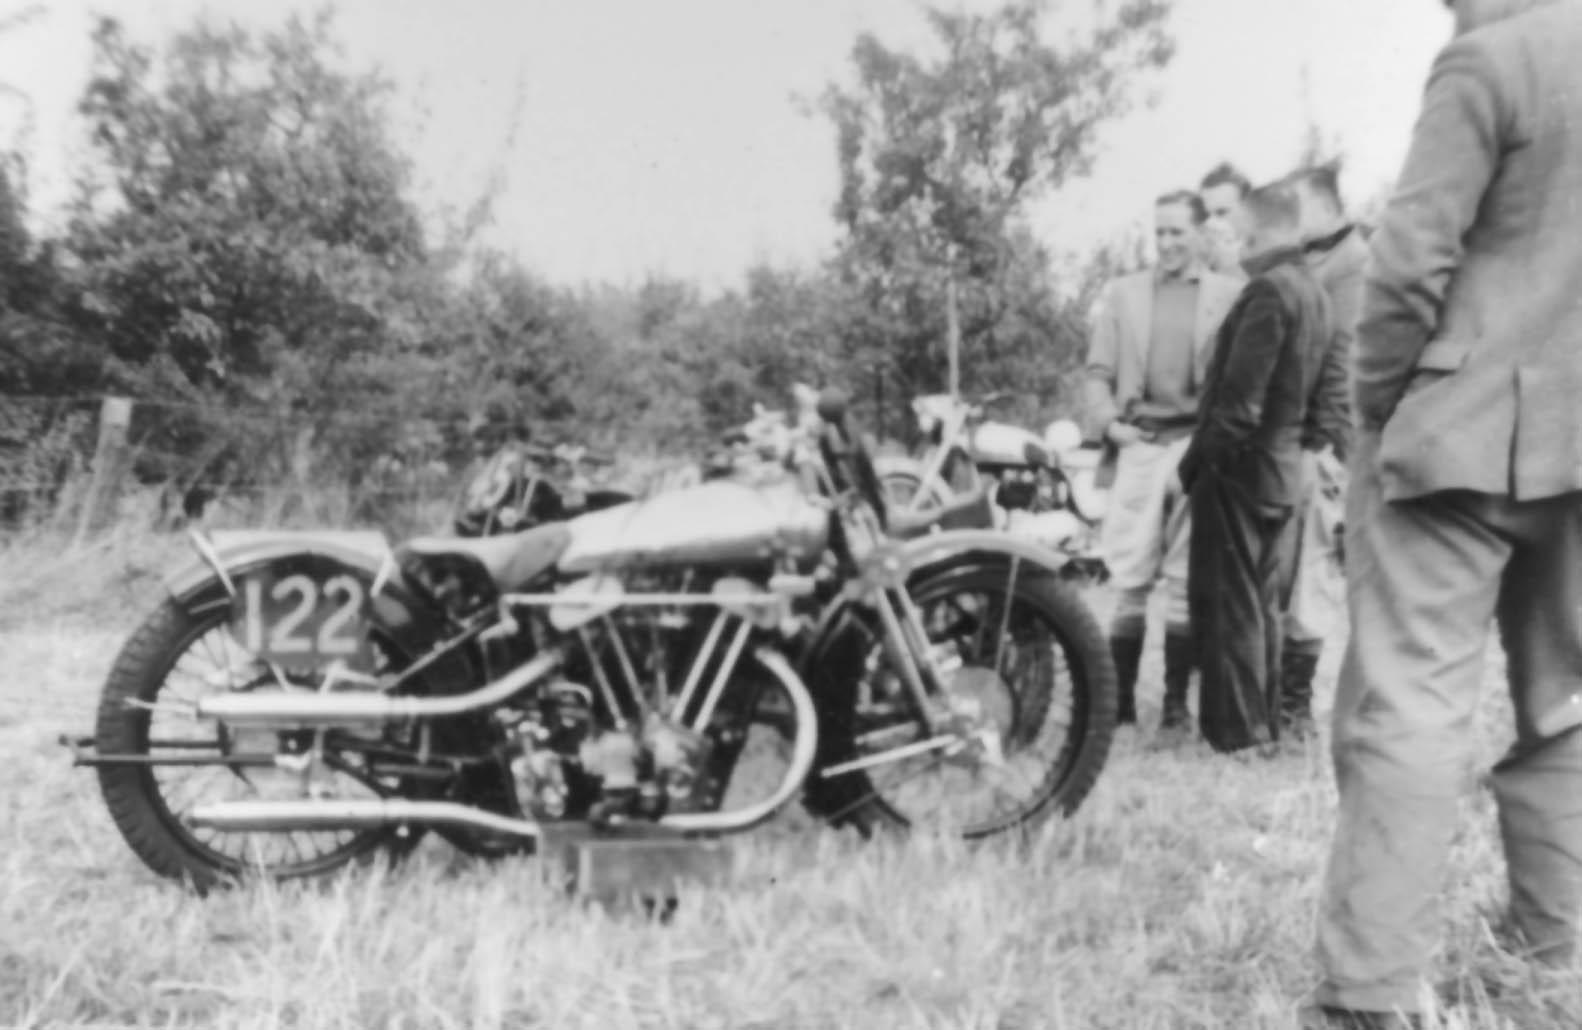 Oldmotodude 1928 Harley Davidson Peashooter Hill Climber: Norton Commando Motorcycle Forum